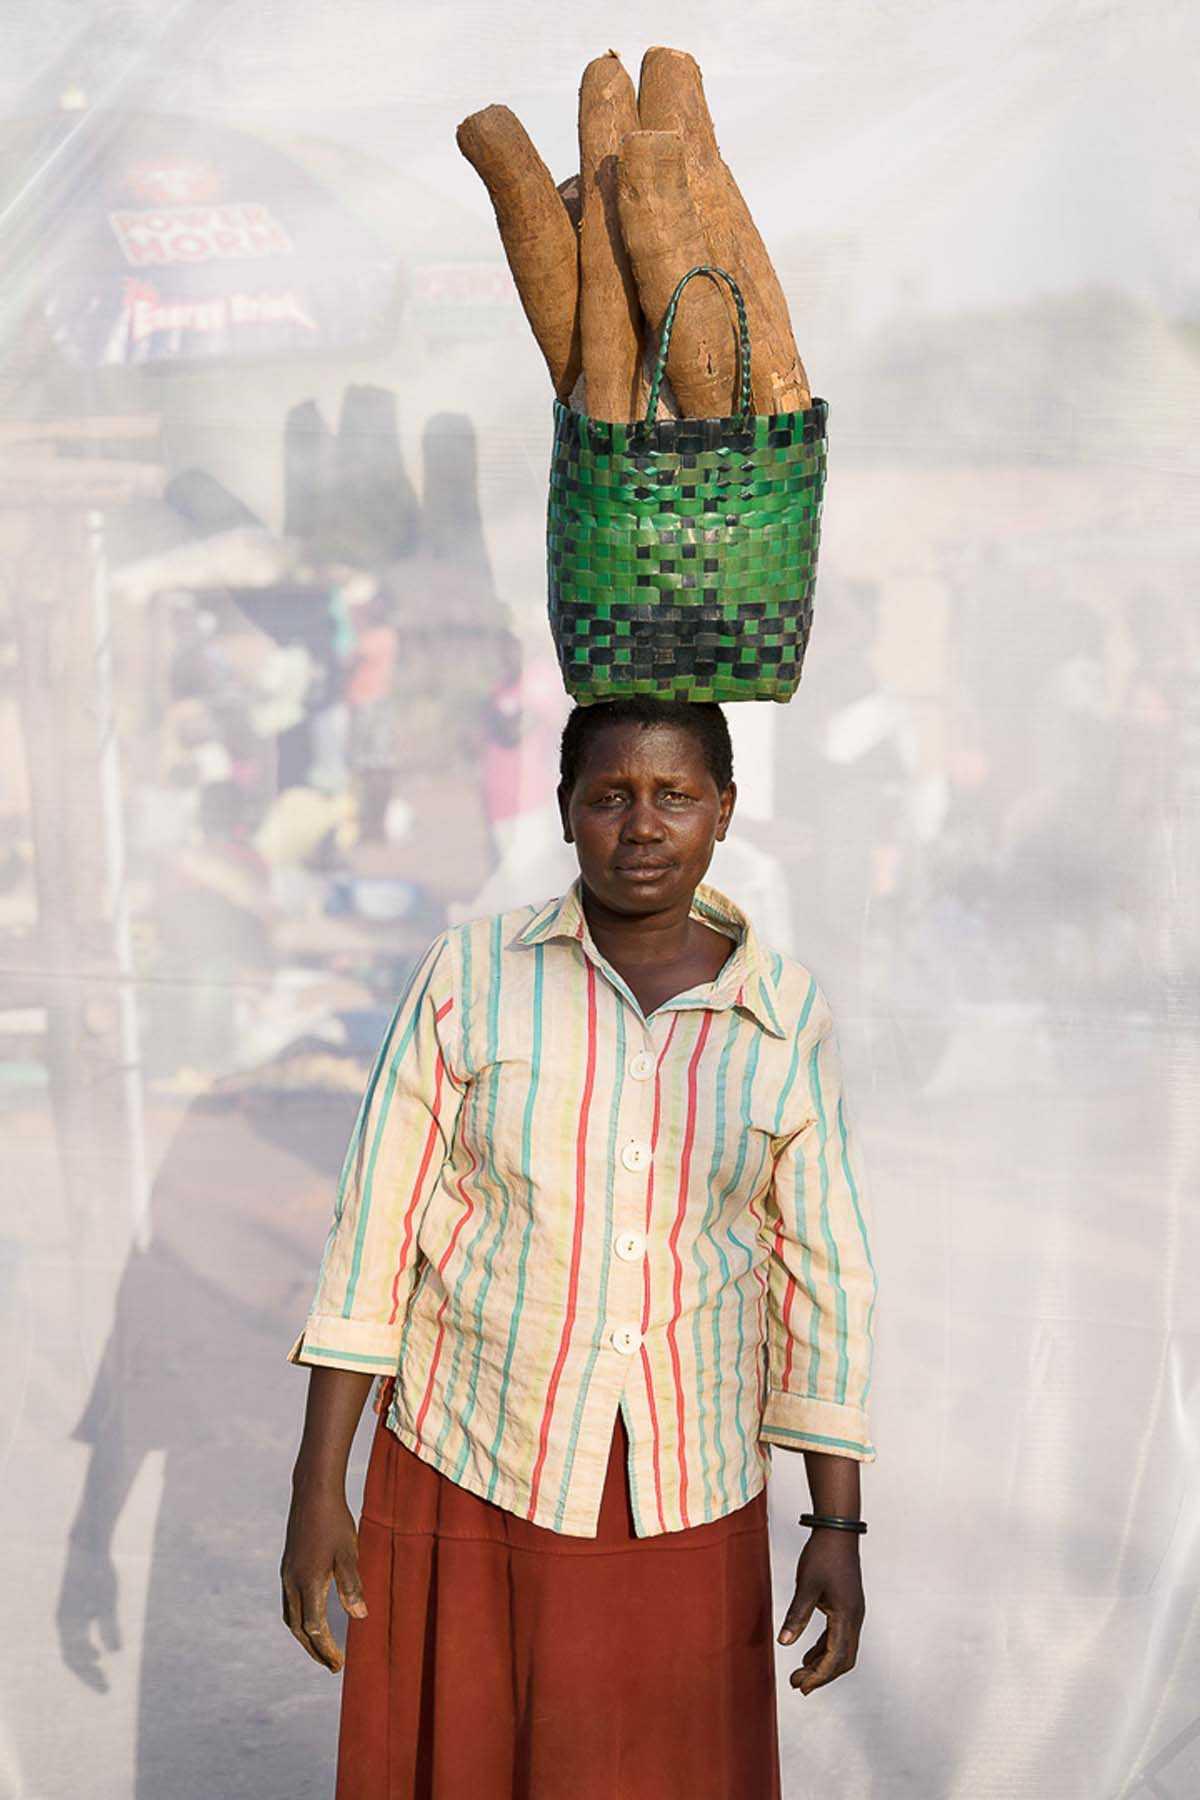 Selling cuava